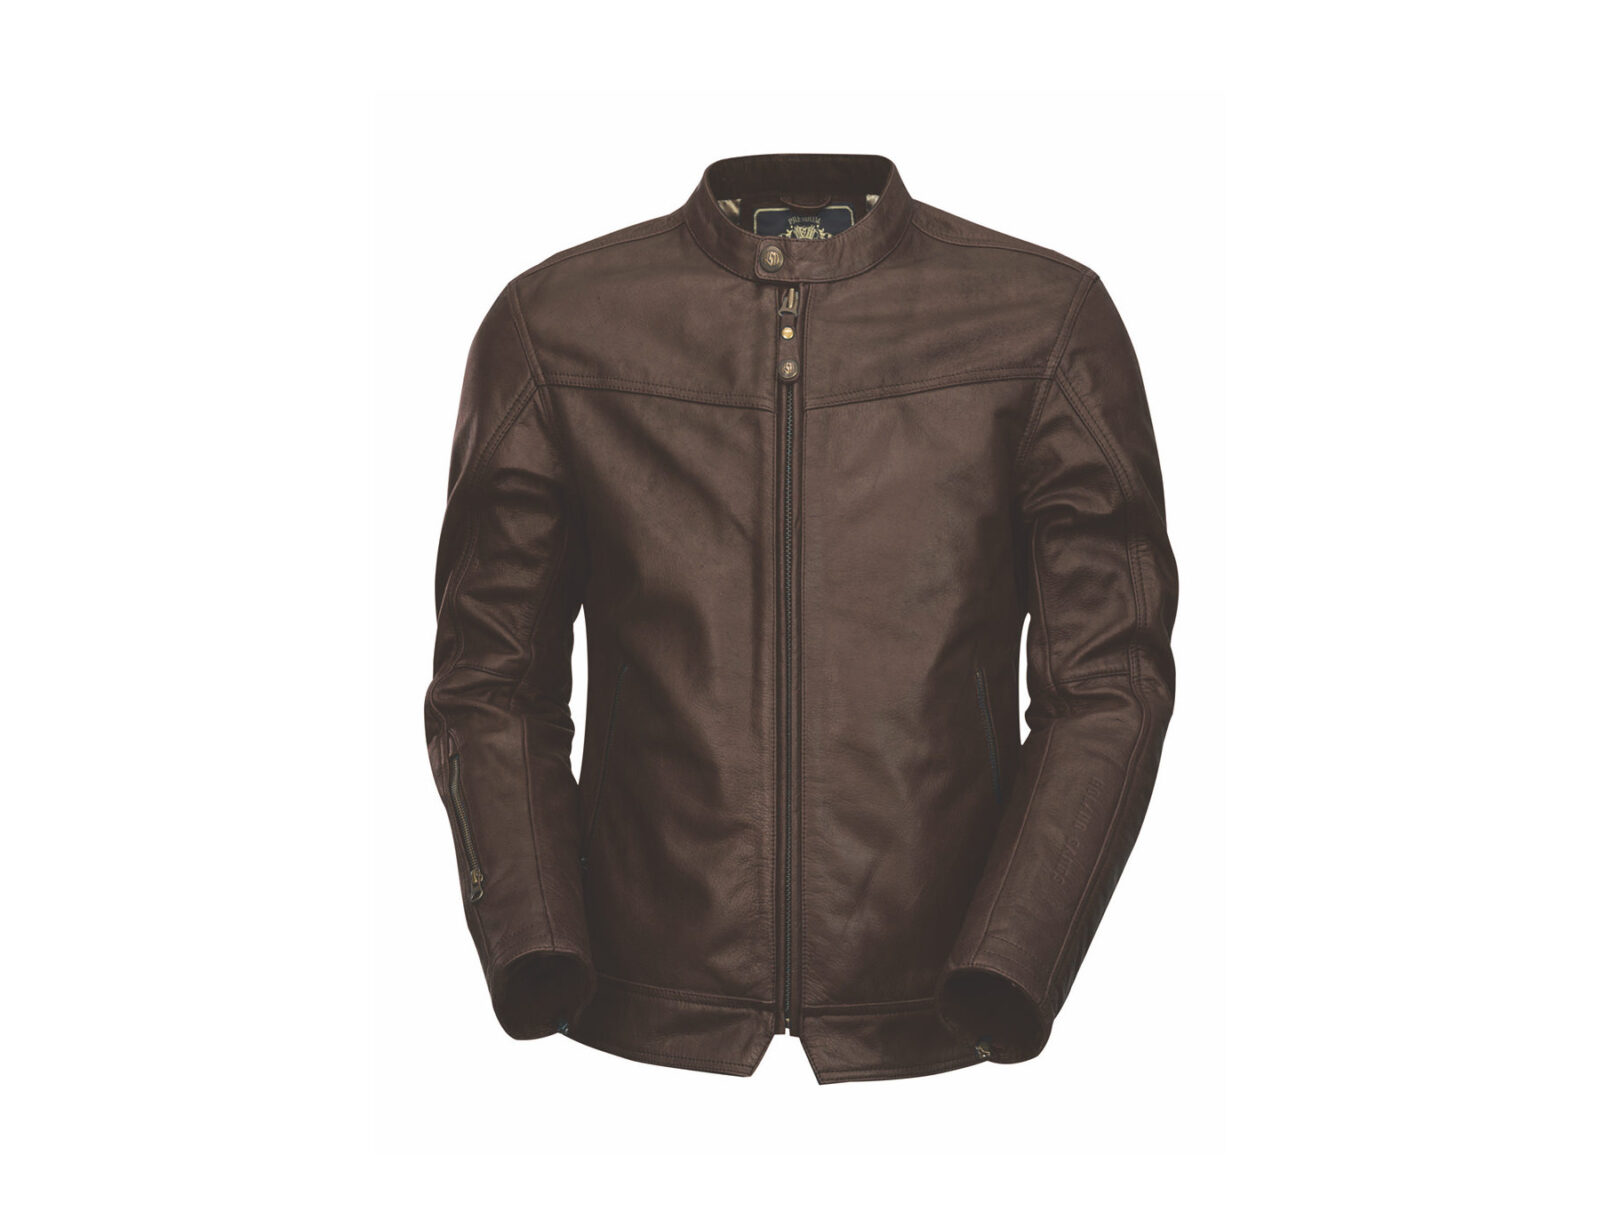 Roland Sands Design Walker Jackets 1600x1220 - Roland Sands Design Walker Jacket